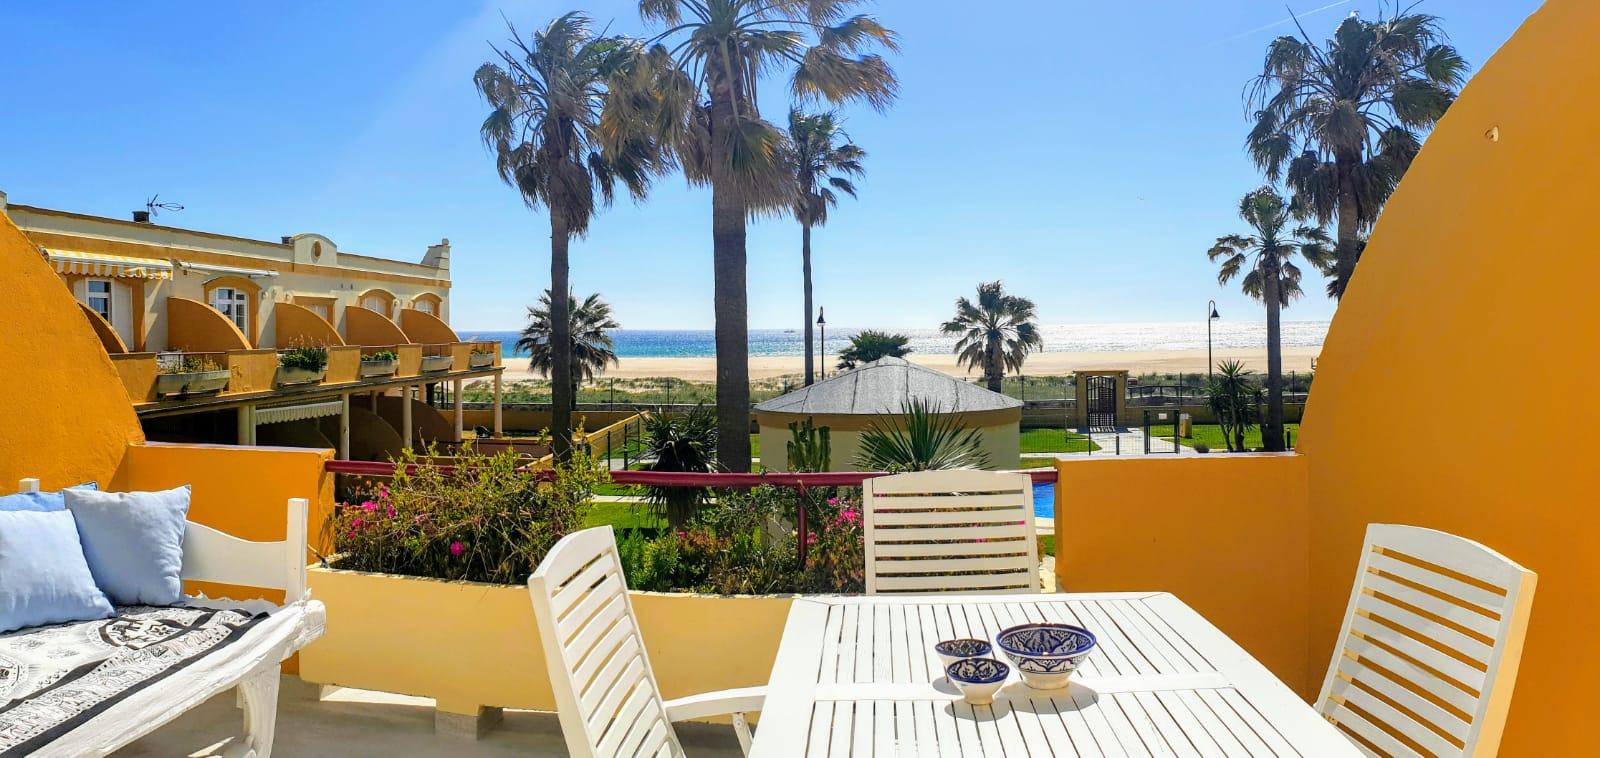 Apartamento en 1era linea de playa en Tarifa